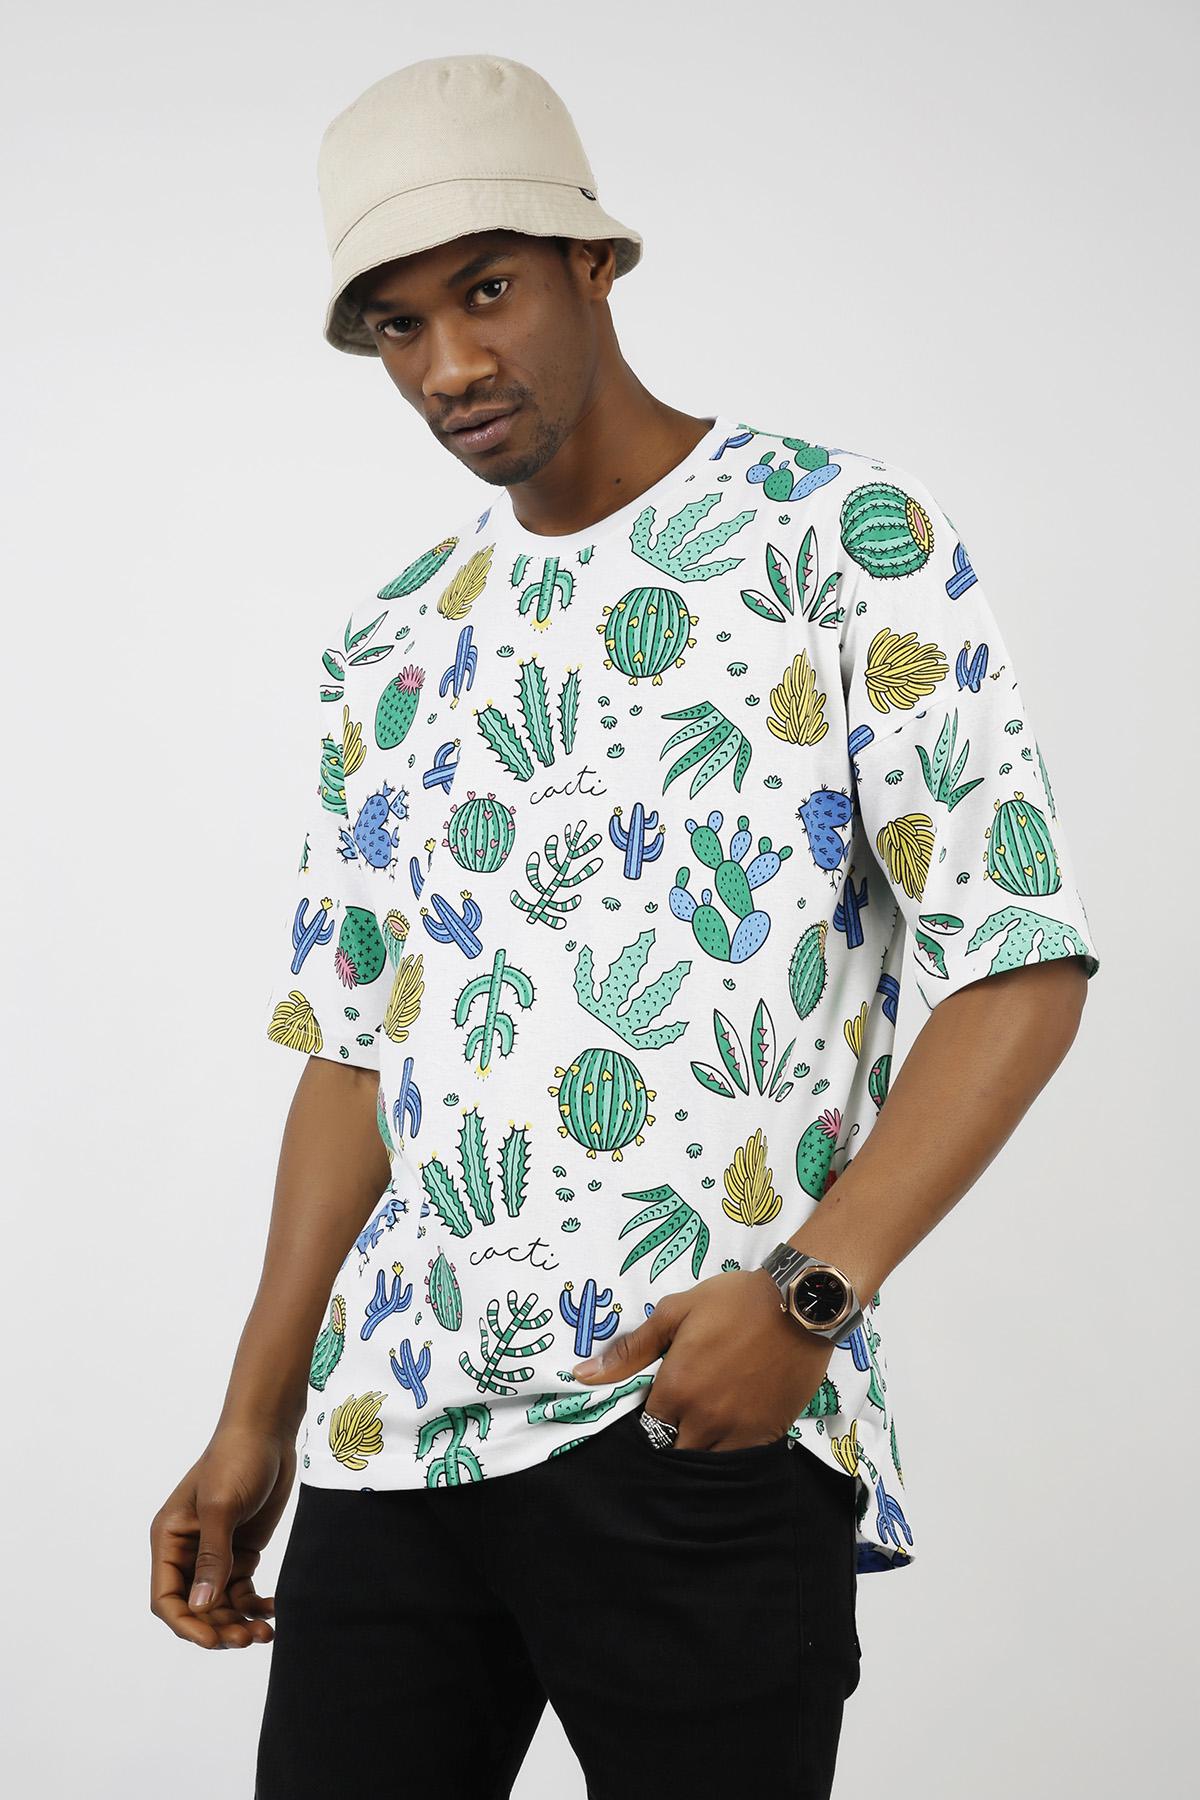 XHAN - Beyaz Kaktüs Desenli Oversize T-Shirt 1KXE1-44724-01